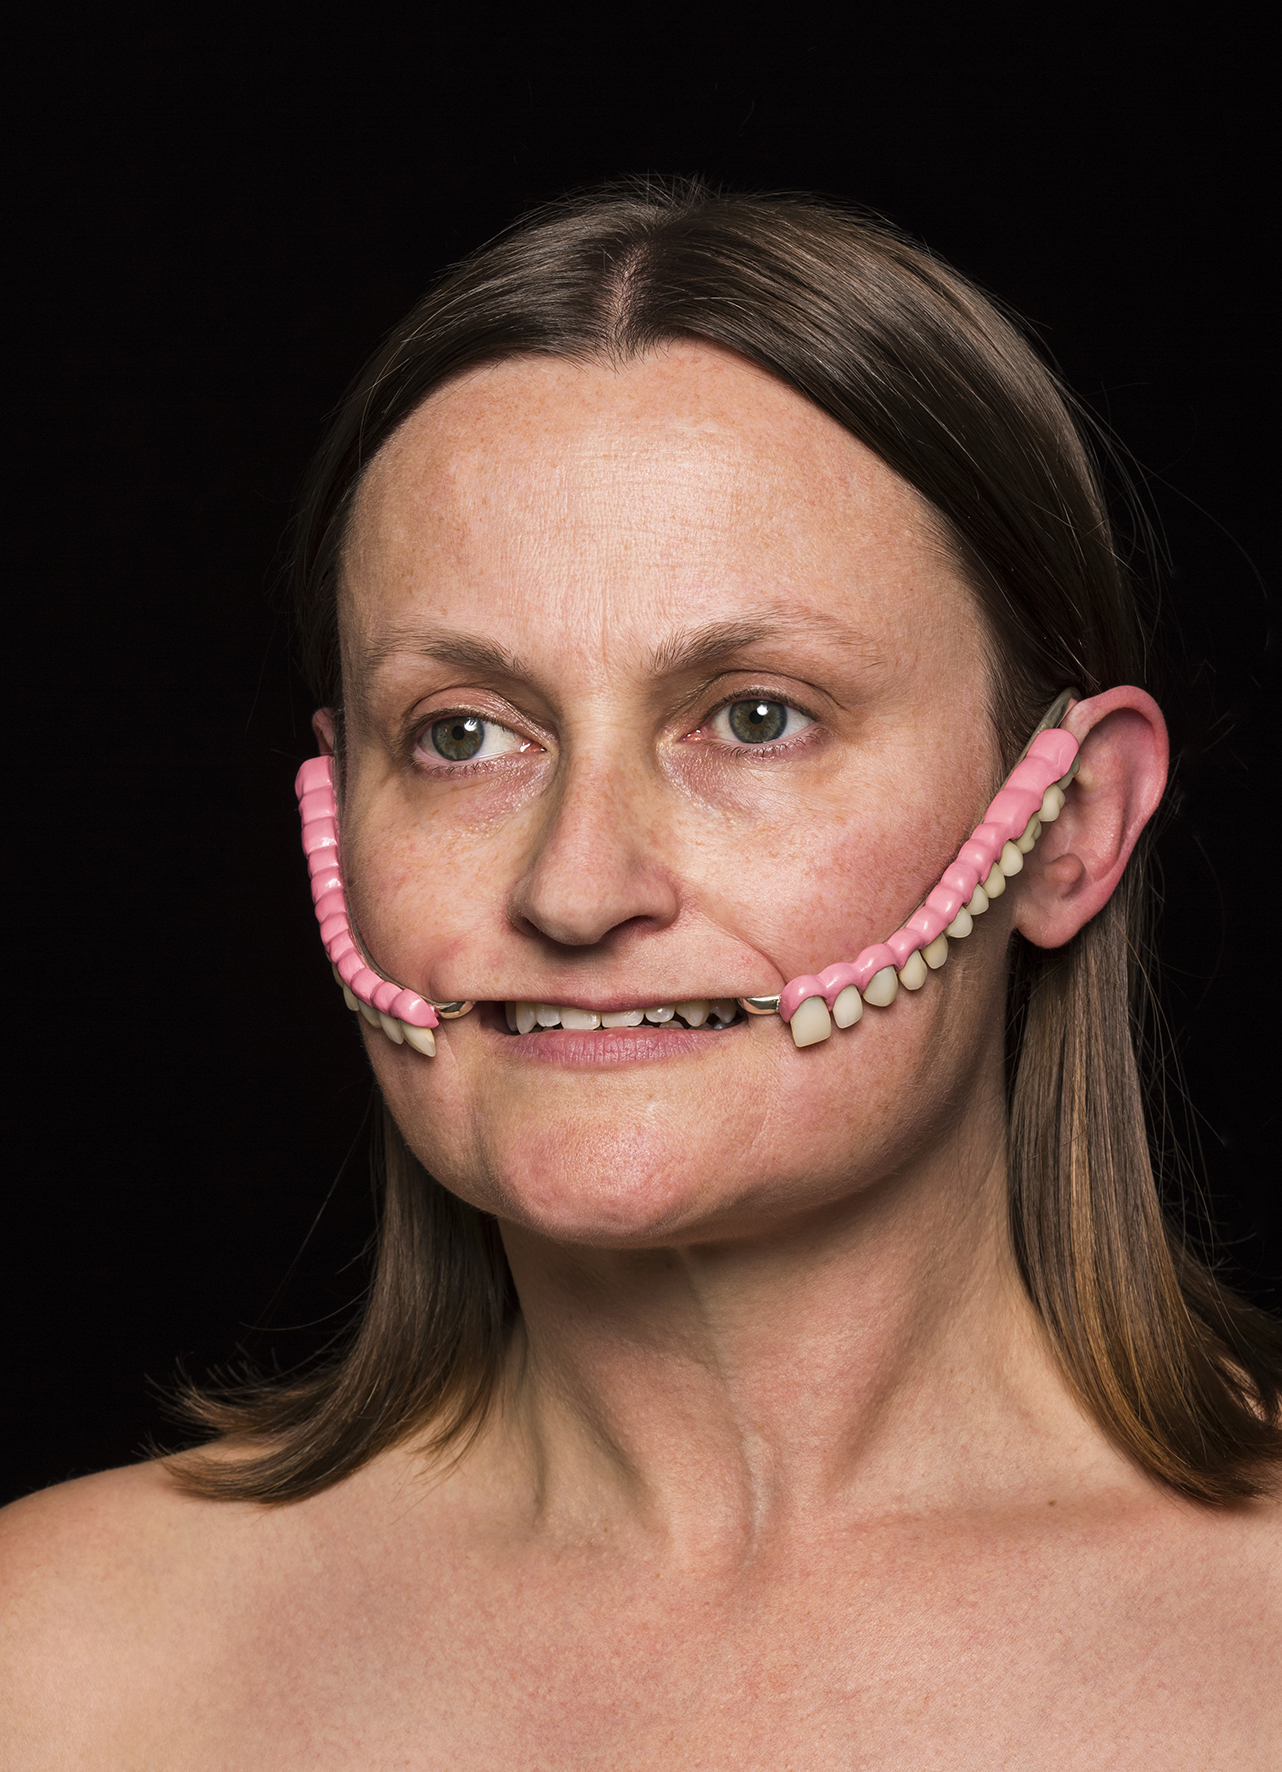 Tiffany Parbs,  gnash , 2018,porcelain teeth, sterling silver enamel paint, giclée print on aluminium, 50 x 125 x 25mm object, 470 x 340 x 12mm print. Photography Tobias Titz